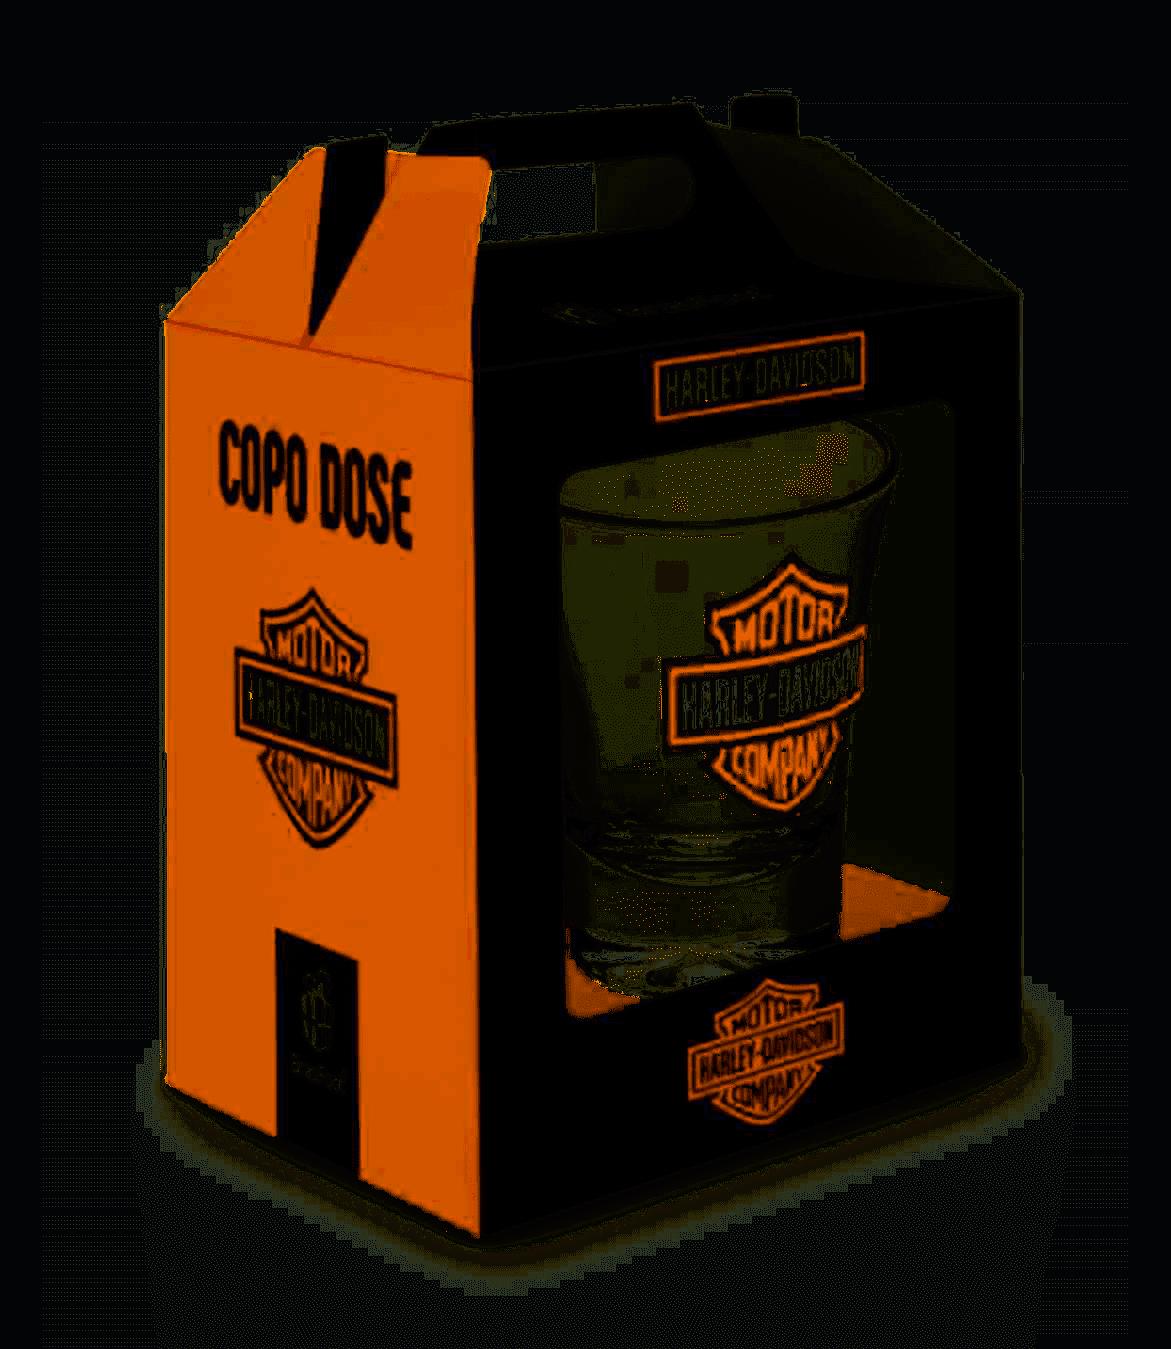 Copo Dose 60ml Individual - Harley Davidson